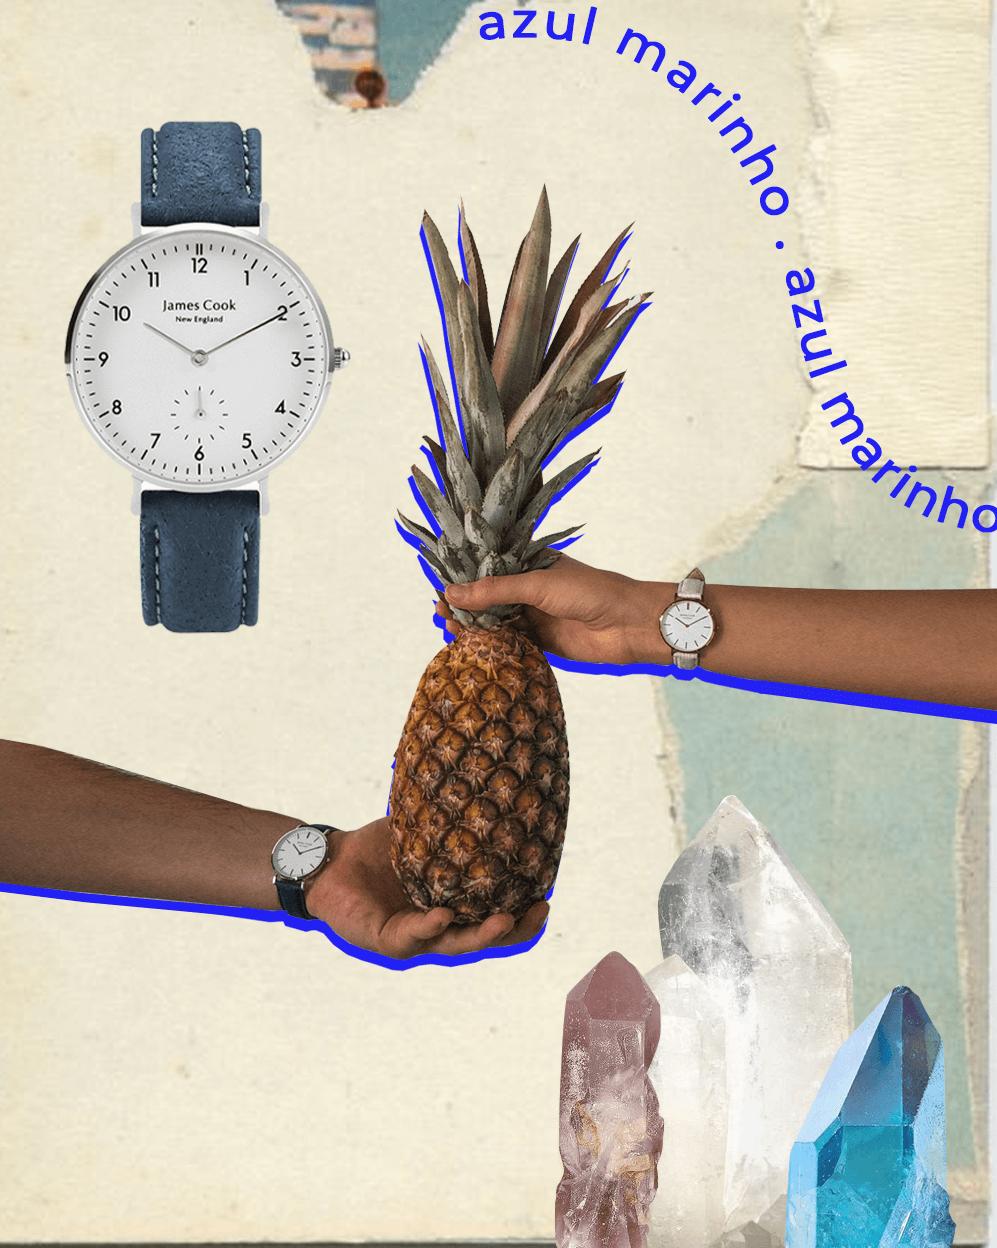 It girls - James Cook - Relógio - Inverno - Em casa - https://stealthelook.com.br